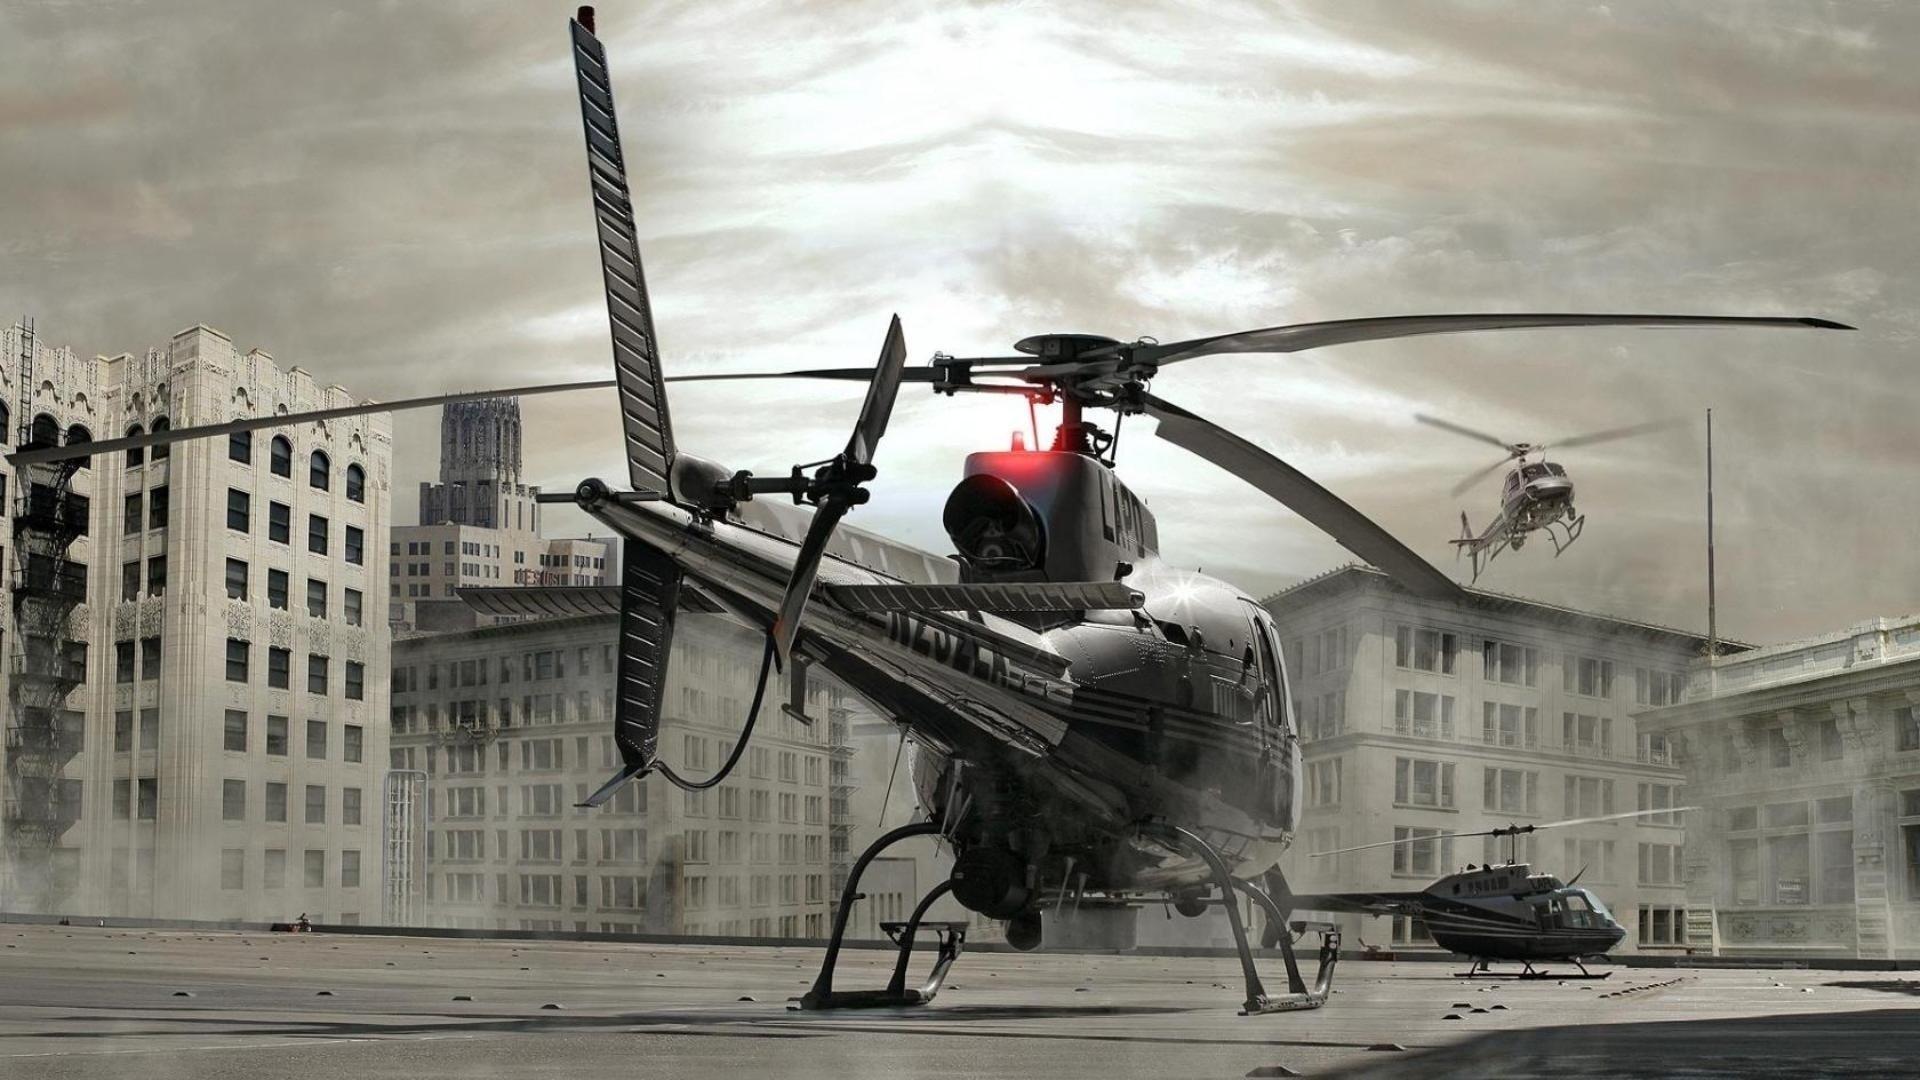 helicopter wallpaper hd desktop - photo #49